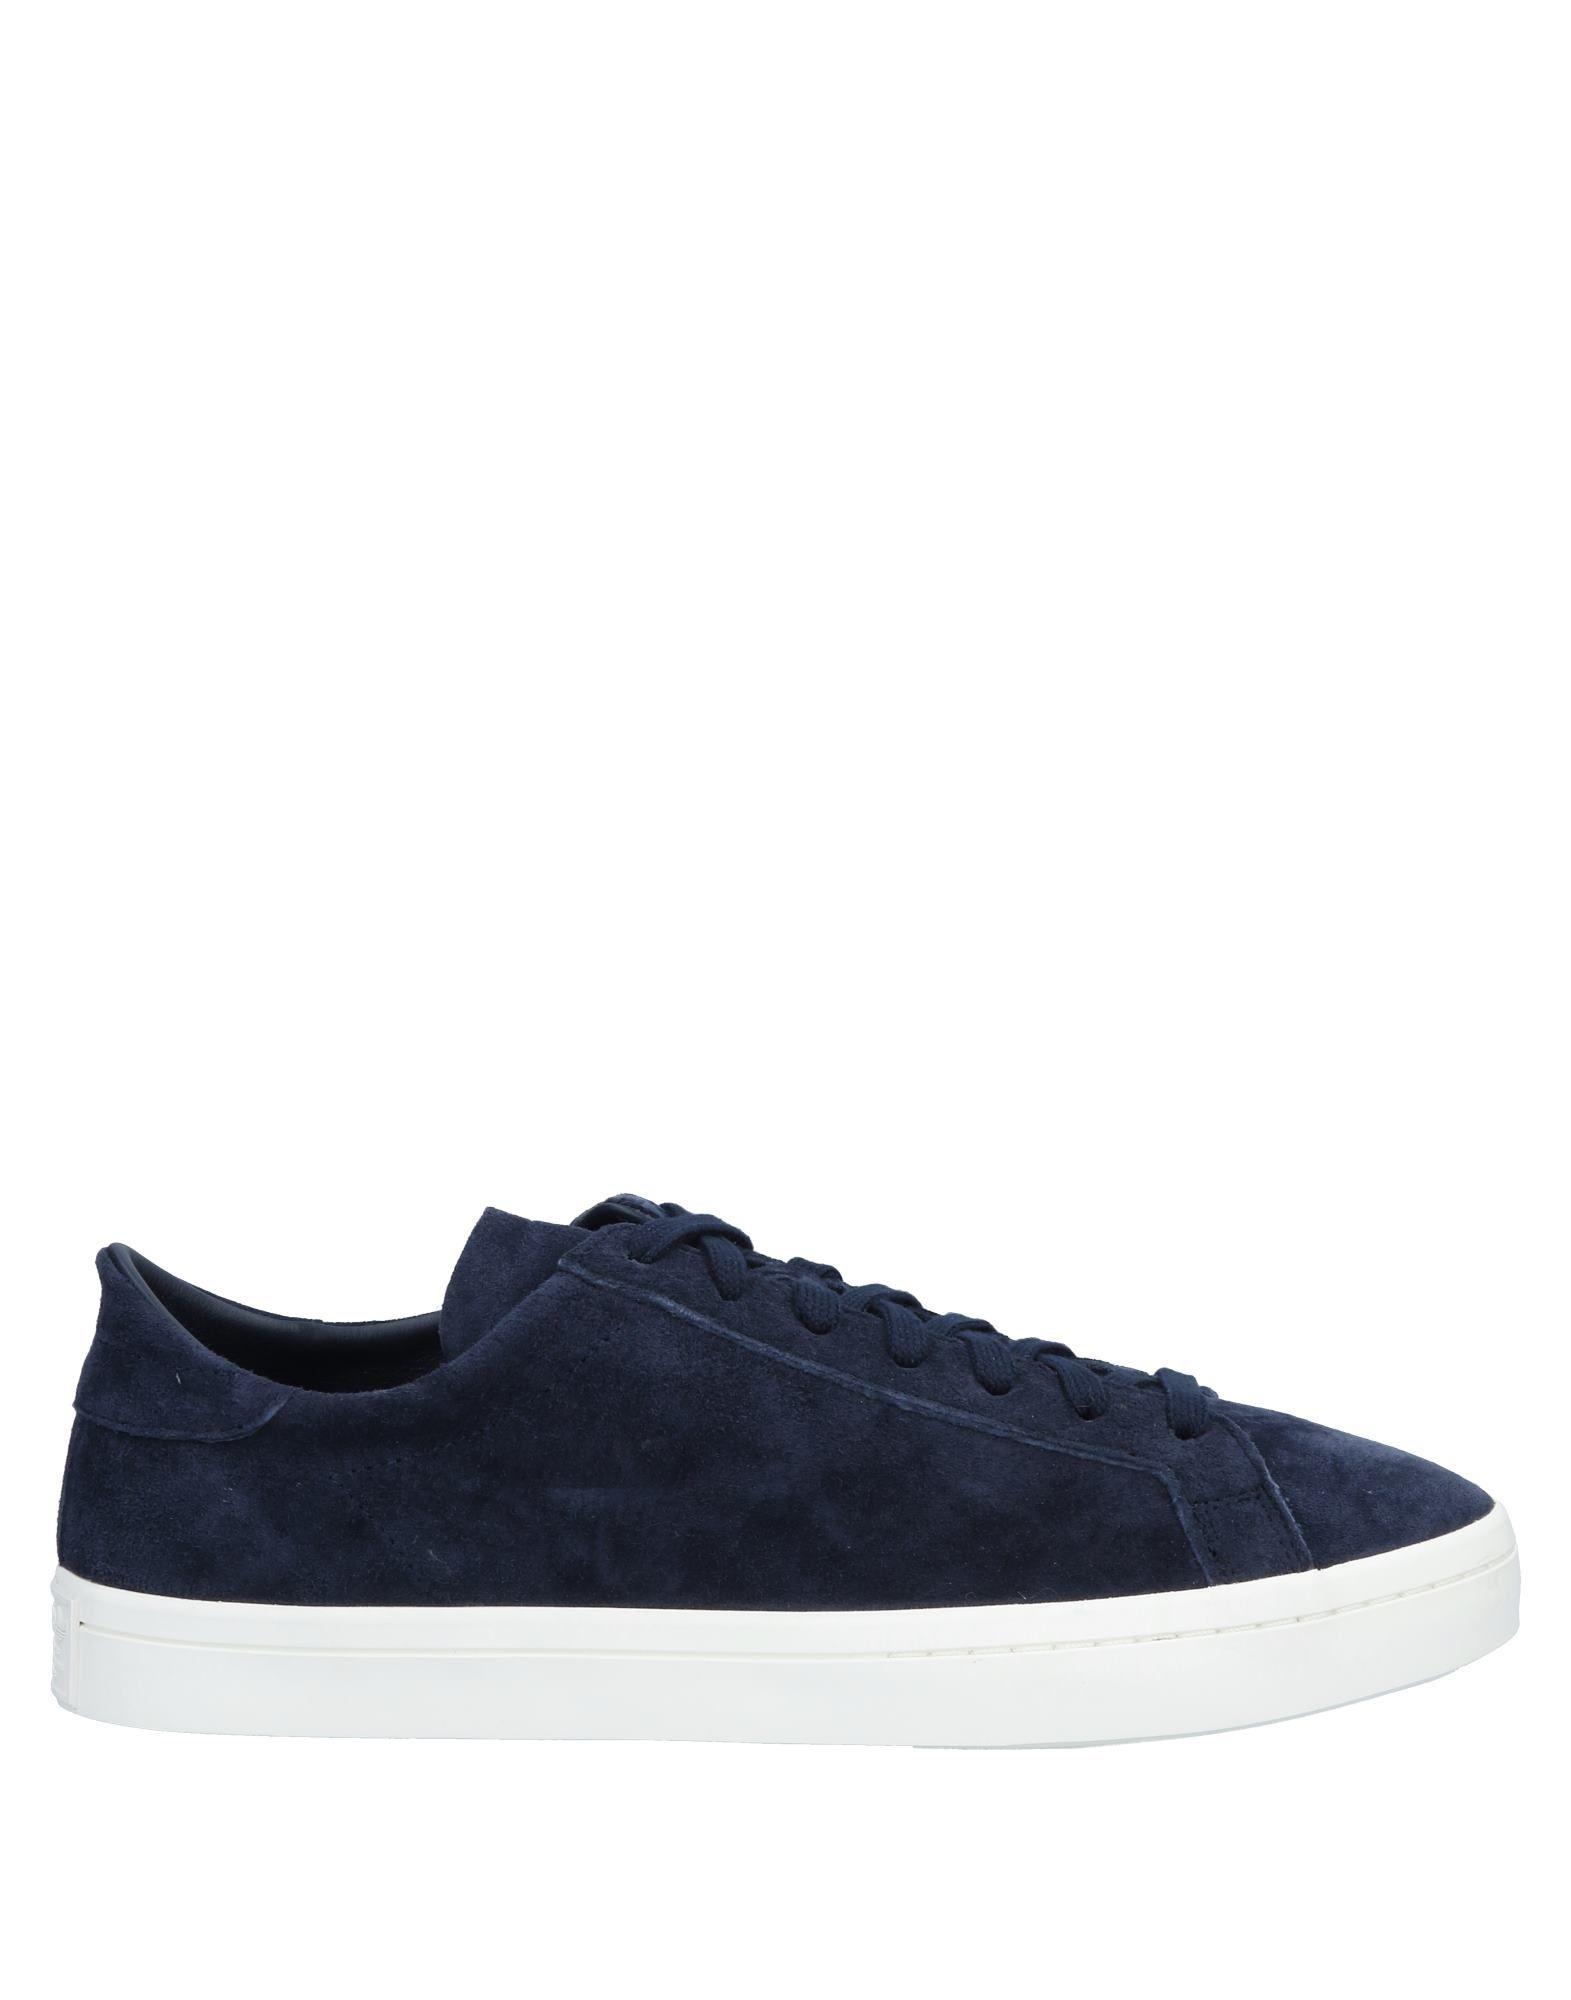 Adidas Originals Sneakers Sneakers - Women Adidas Originals Sneakers Sneakers online on  United Kingdom - 11560744KU 0ec170